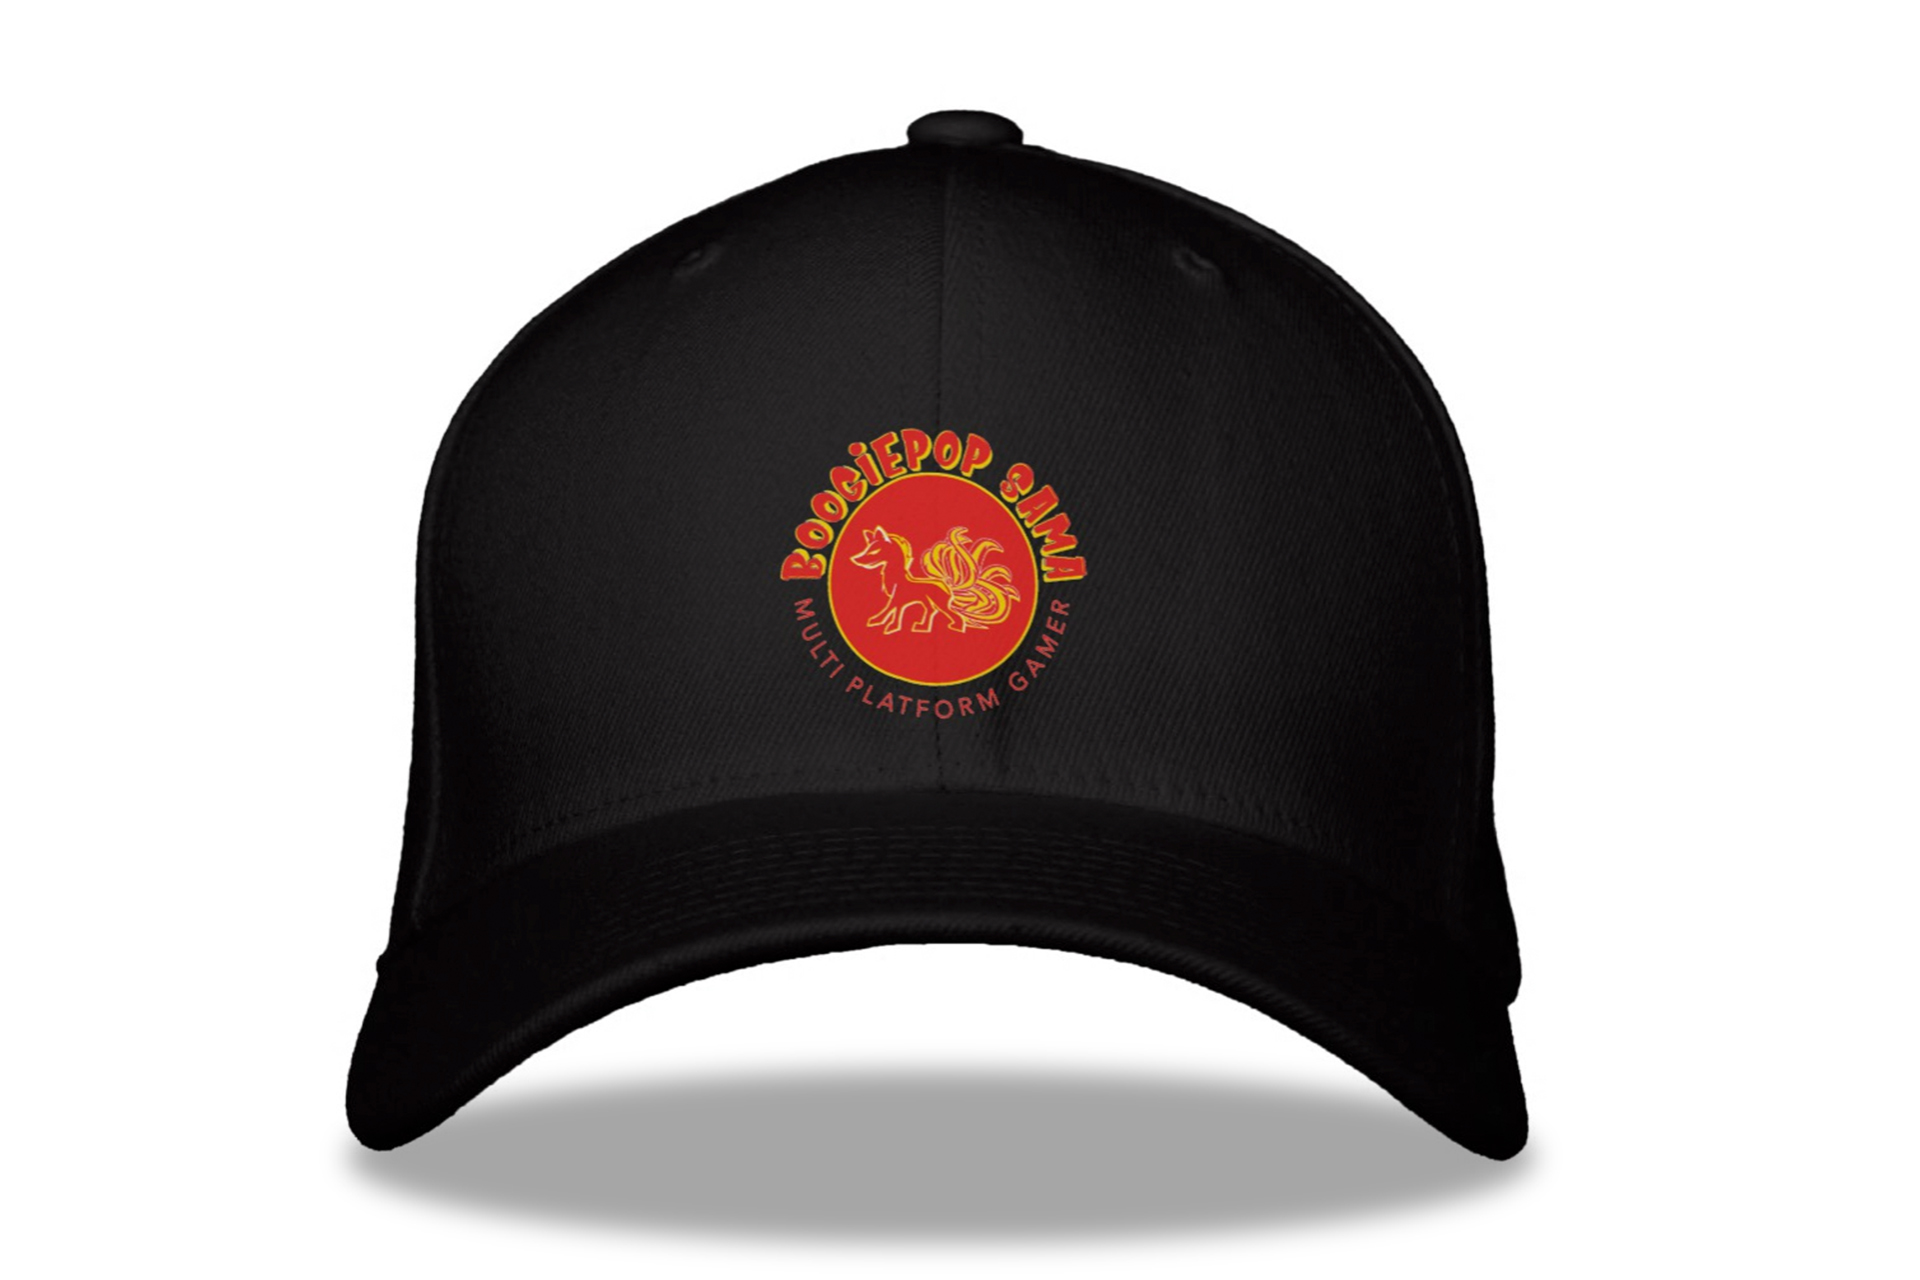 BPS hat